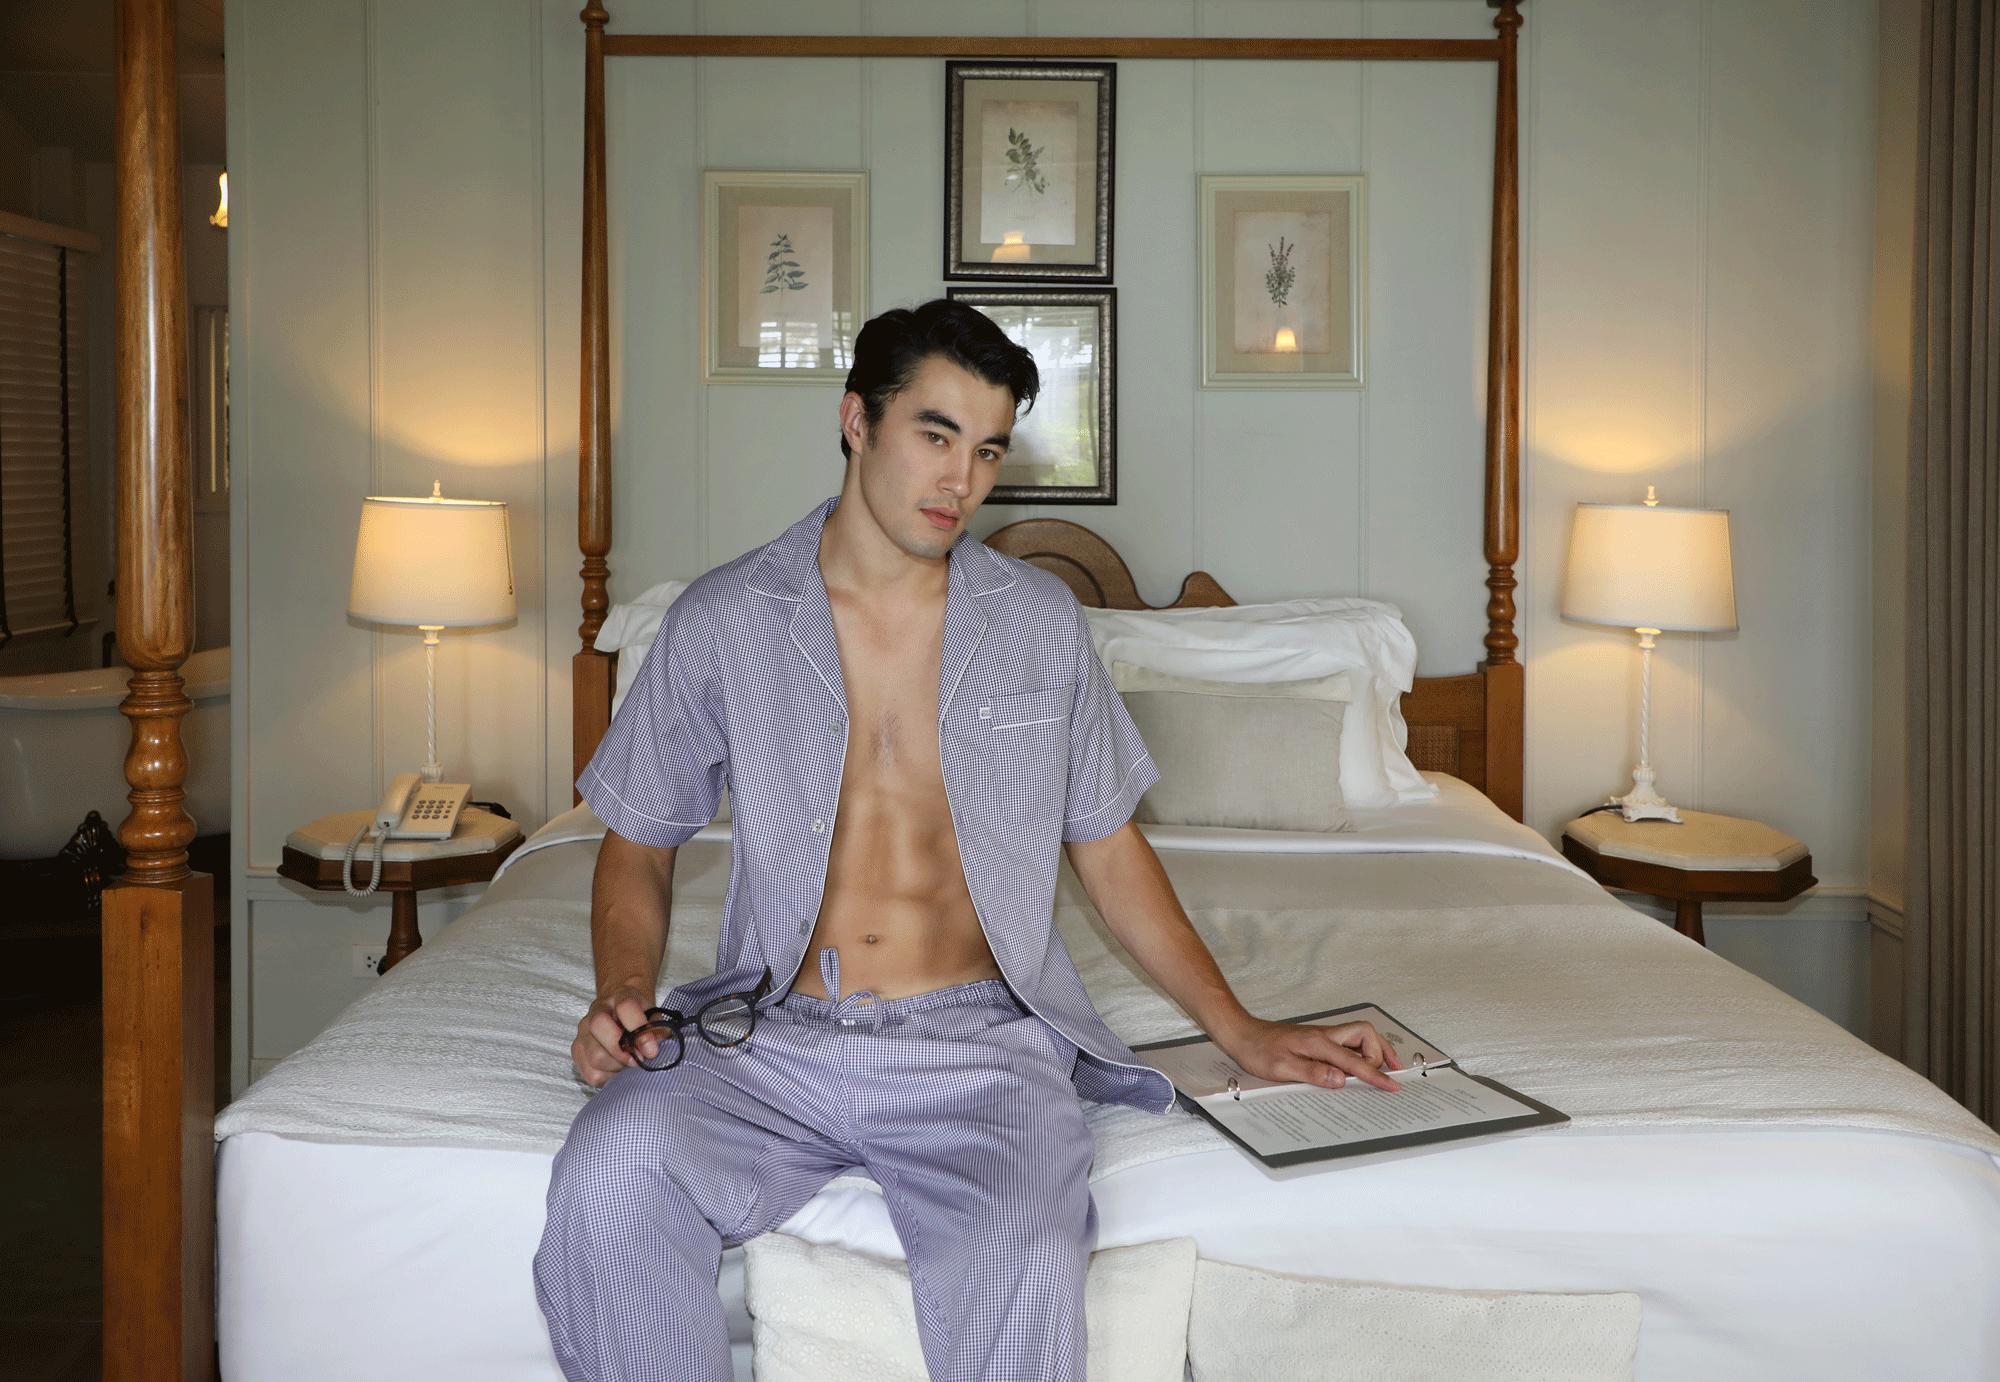 pyjama : JOCKEY / eyeglasses : IZIPIZI